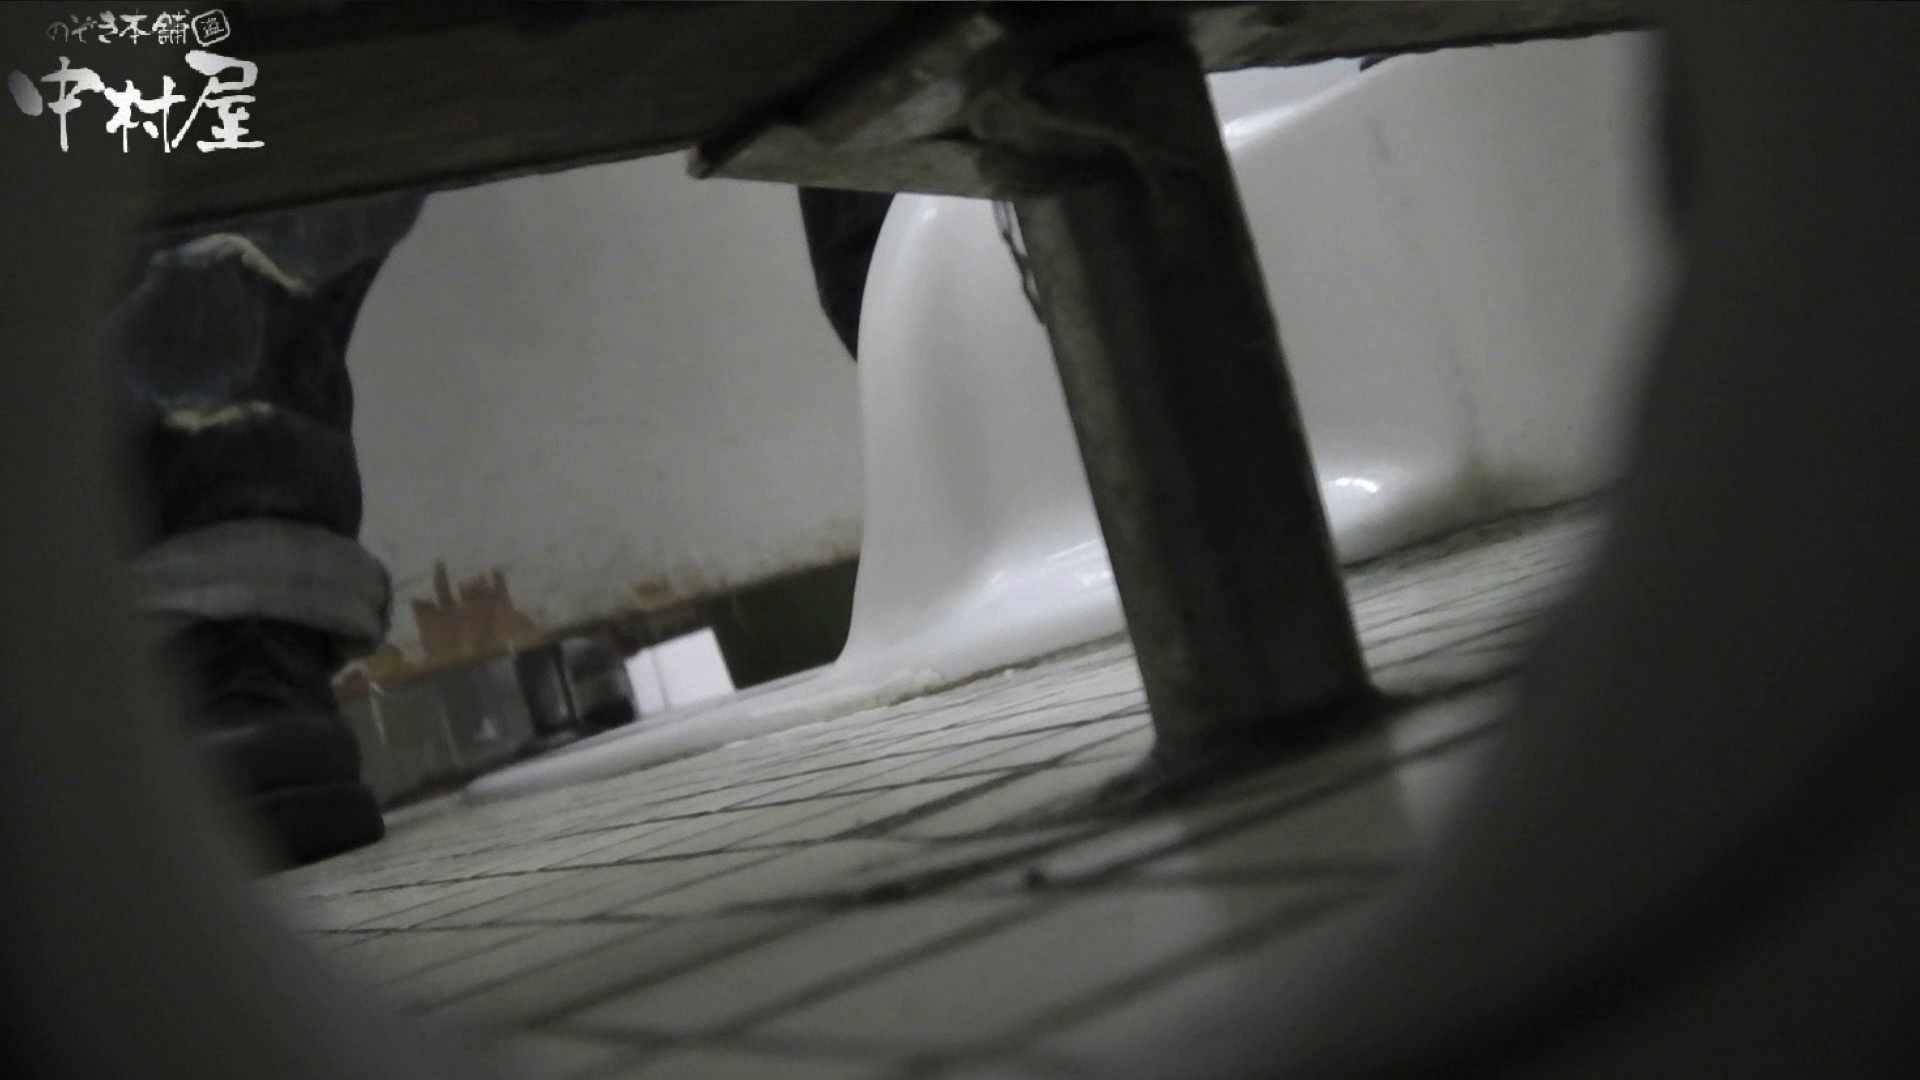 vol.01 命がけ潜伏洗面所! スニーカーブリブリ! プライベート | 洗面所編  111PIX 100